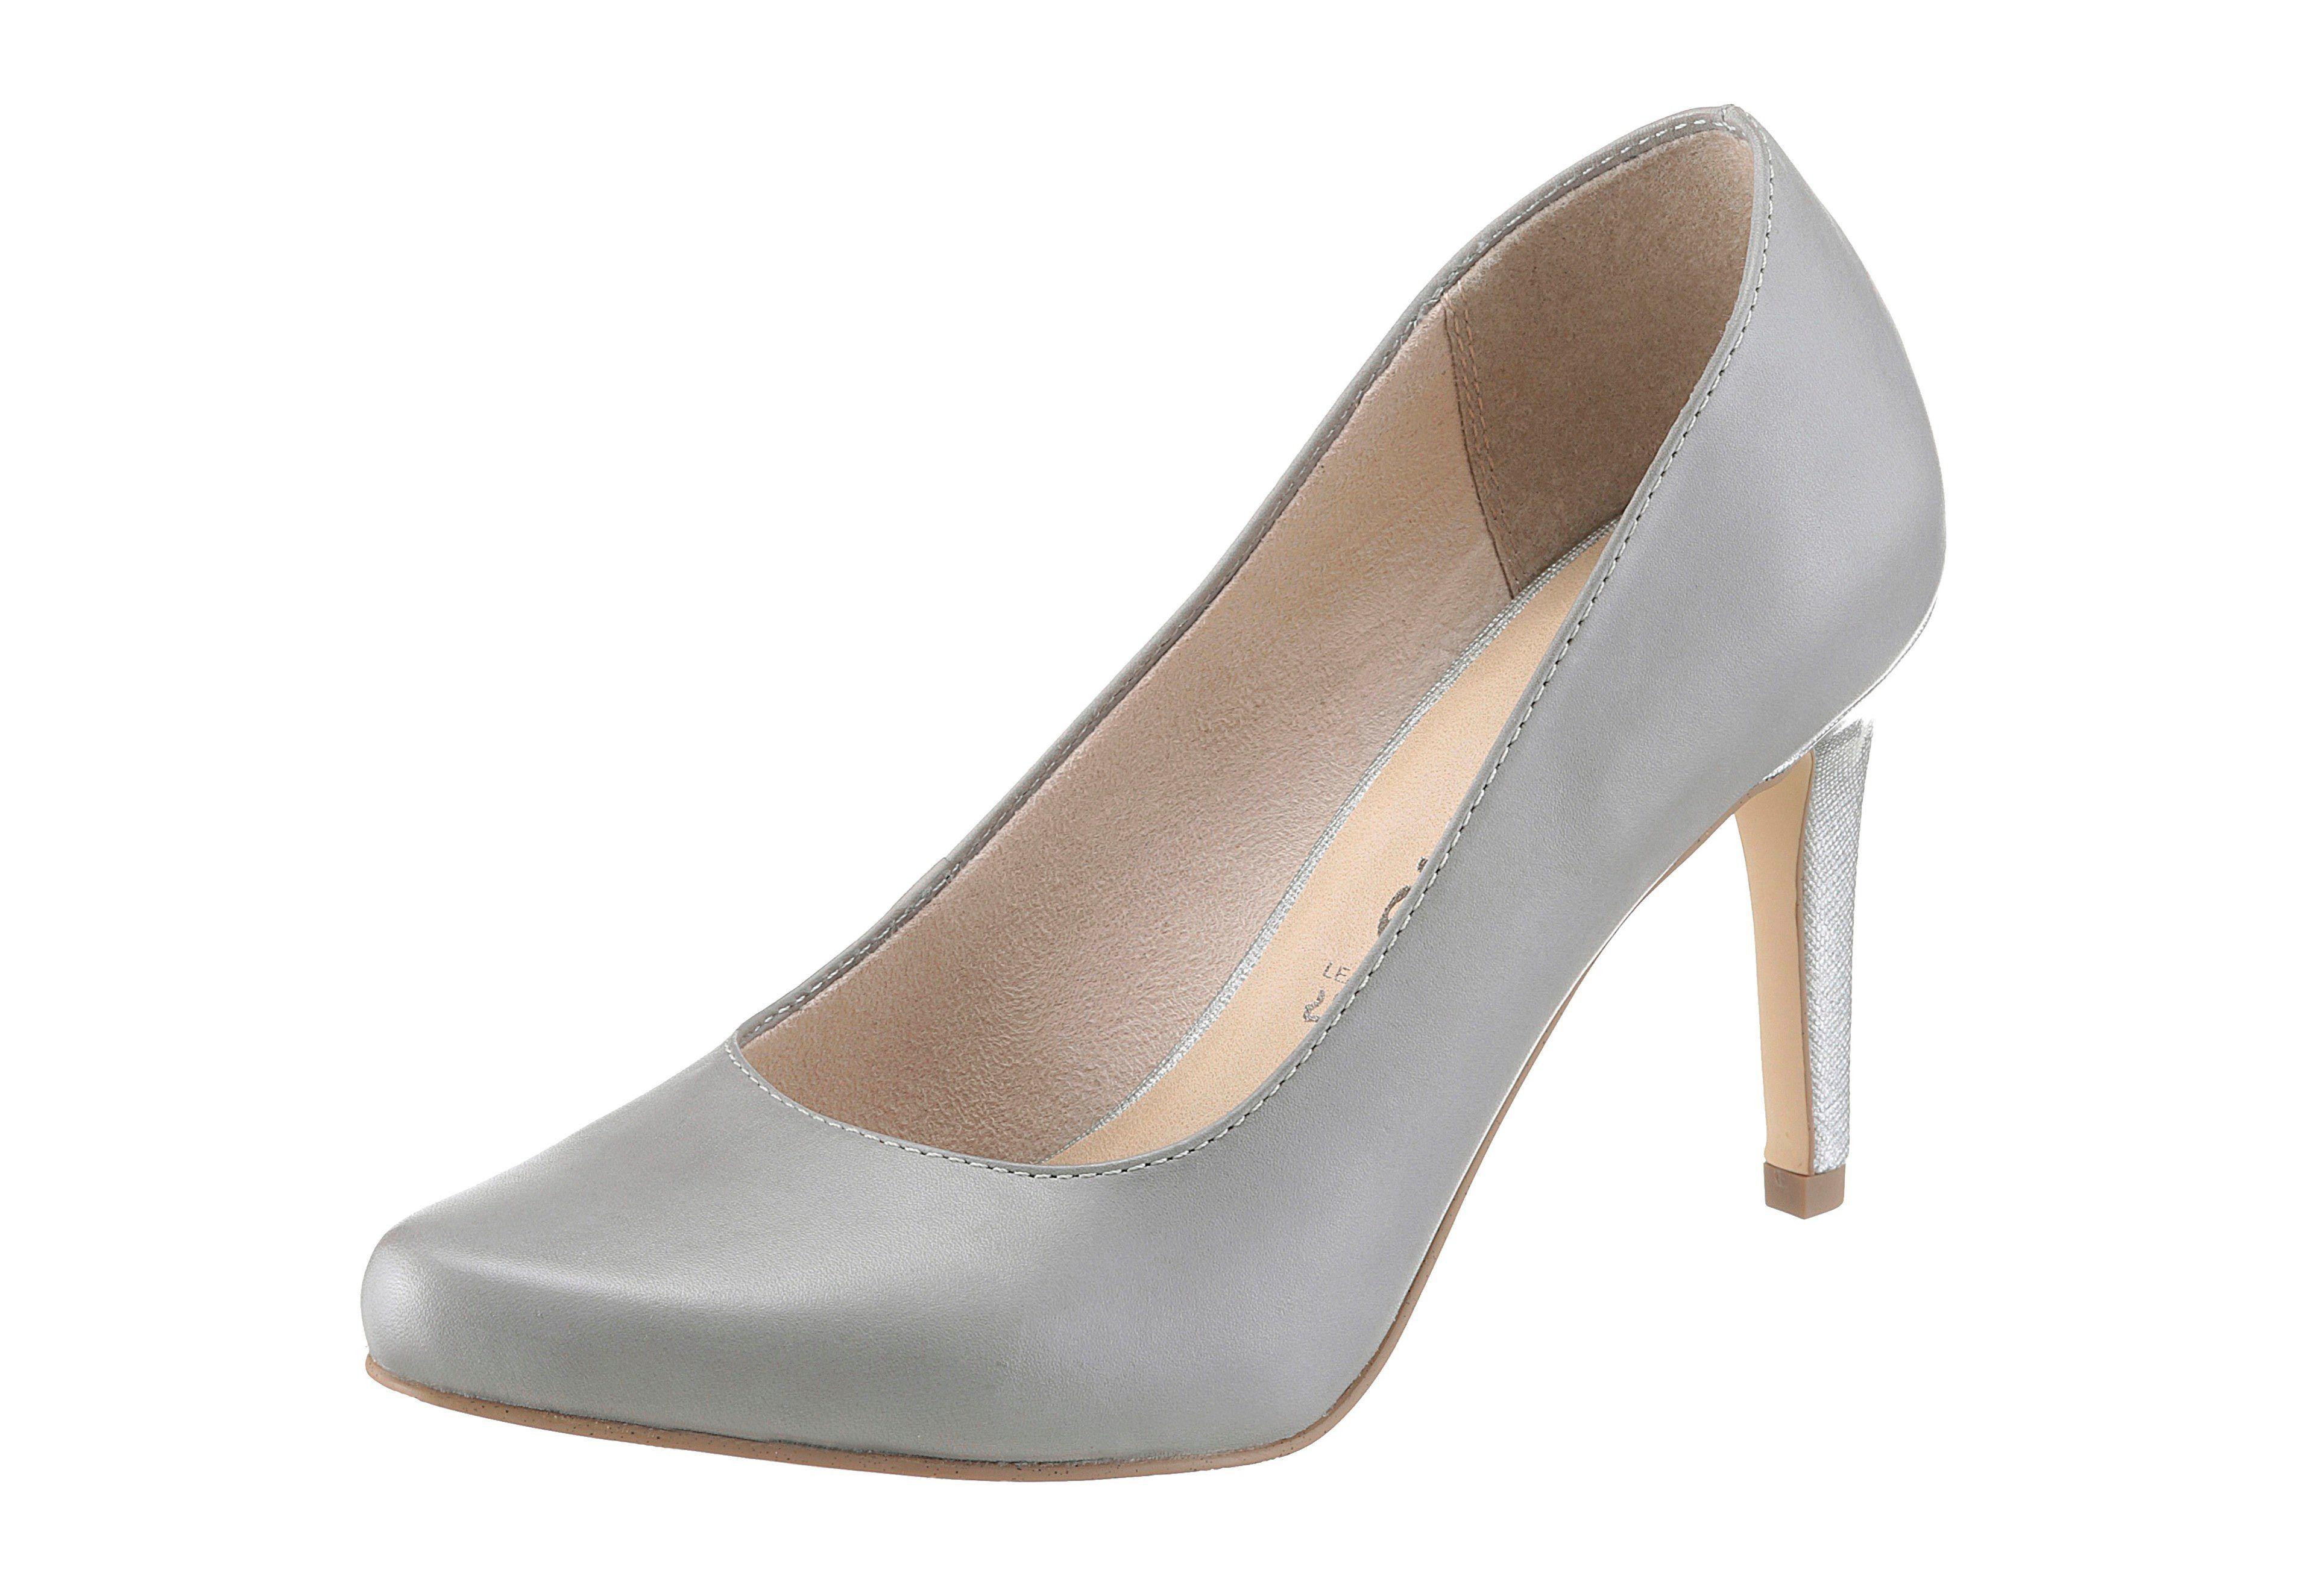 2cb02807e3262f Schuhe24 Damen Sling-Pumps von tamaris beige